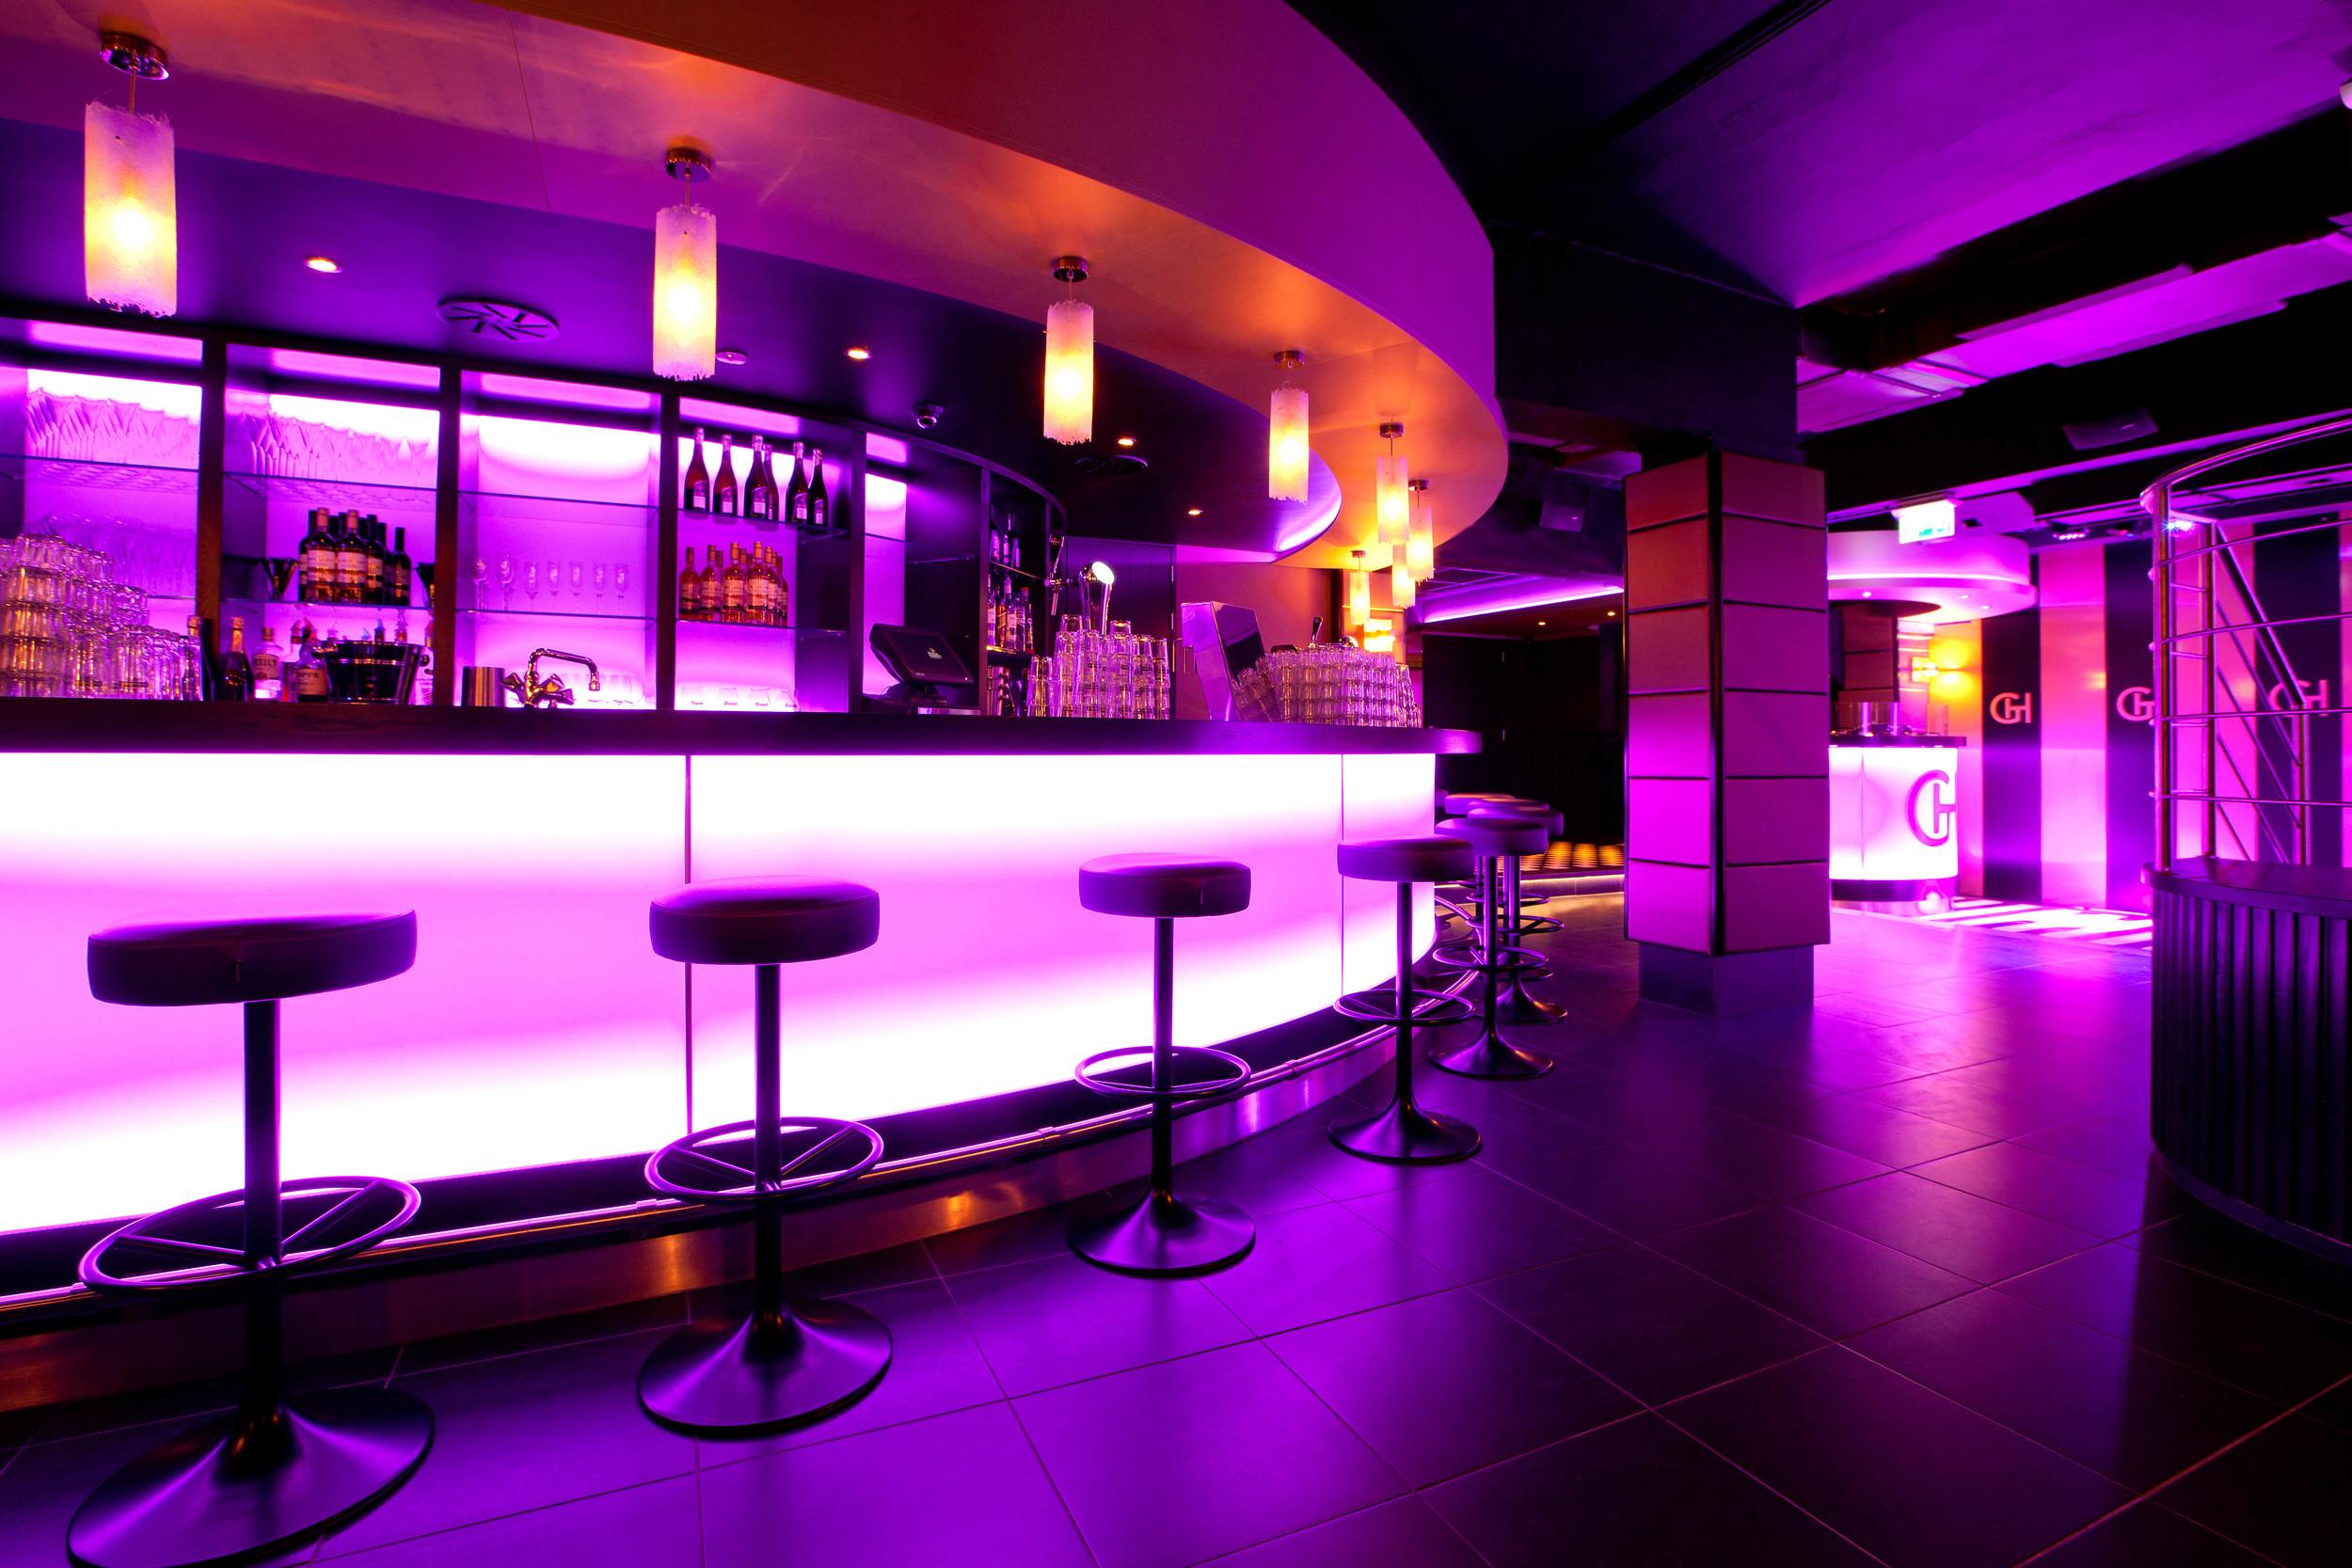 Hotel Restaurant 't Goude Hooft Den Haag-20.jpg